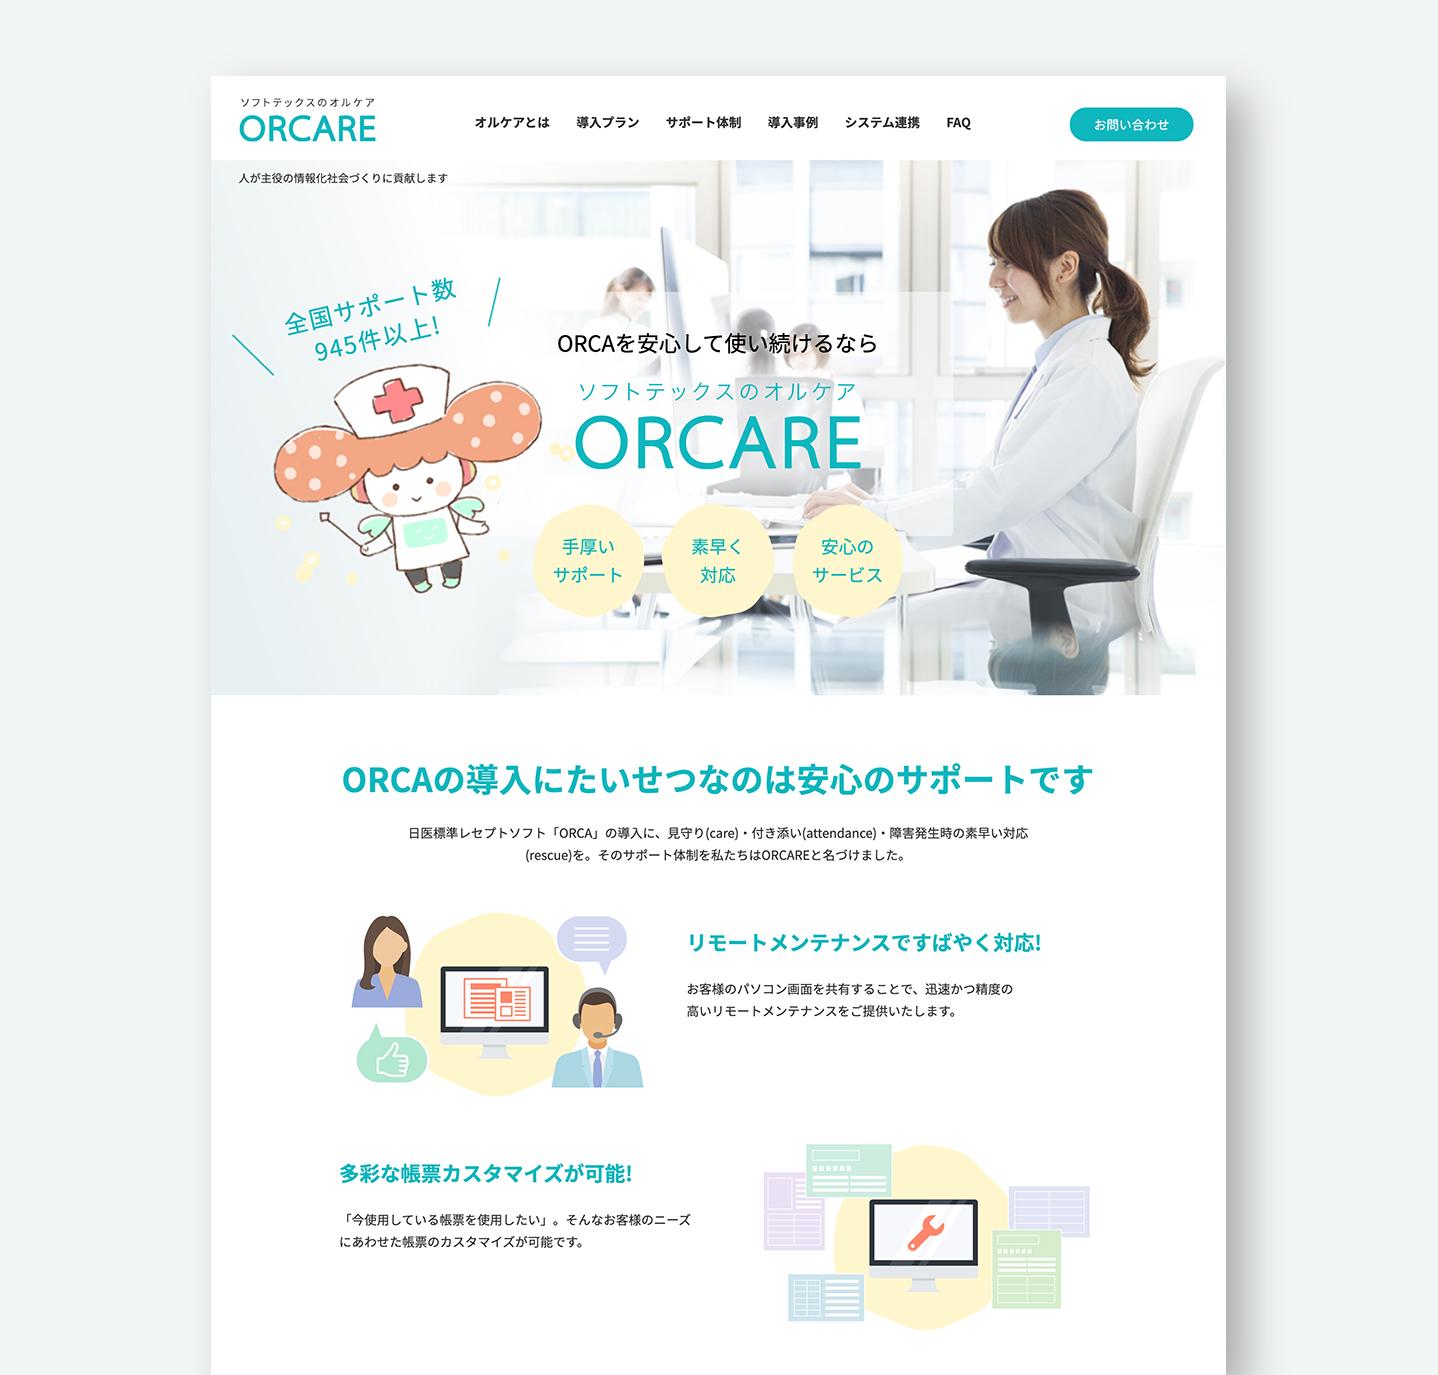 ORCAREサイト トップページ